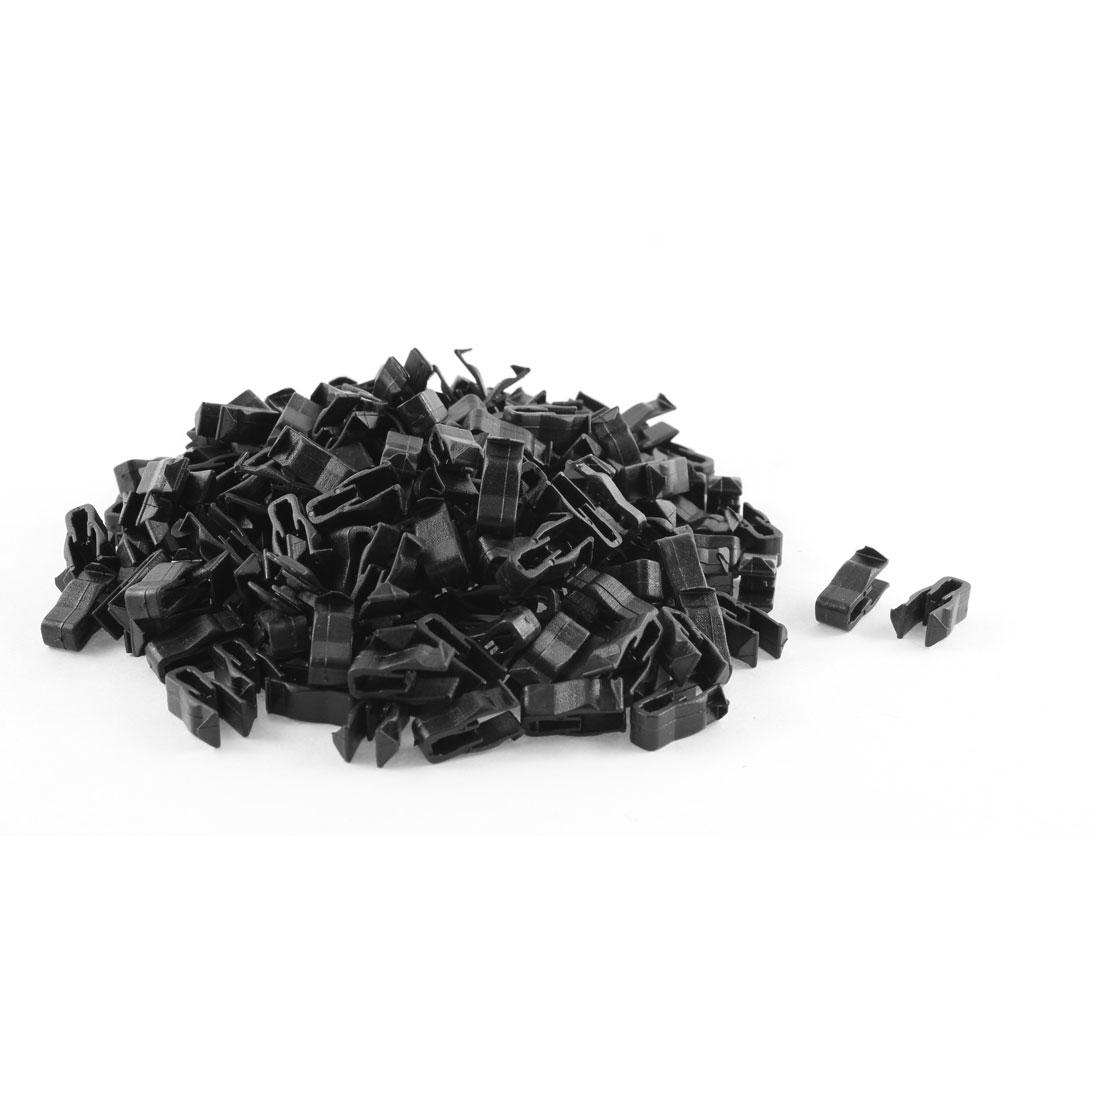 200 Pcs Black Plastic Rivet Trim Fastener Retainer Clips for 5mm Hole